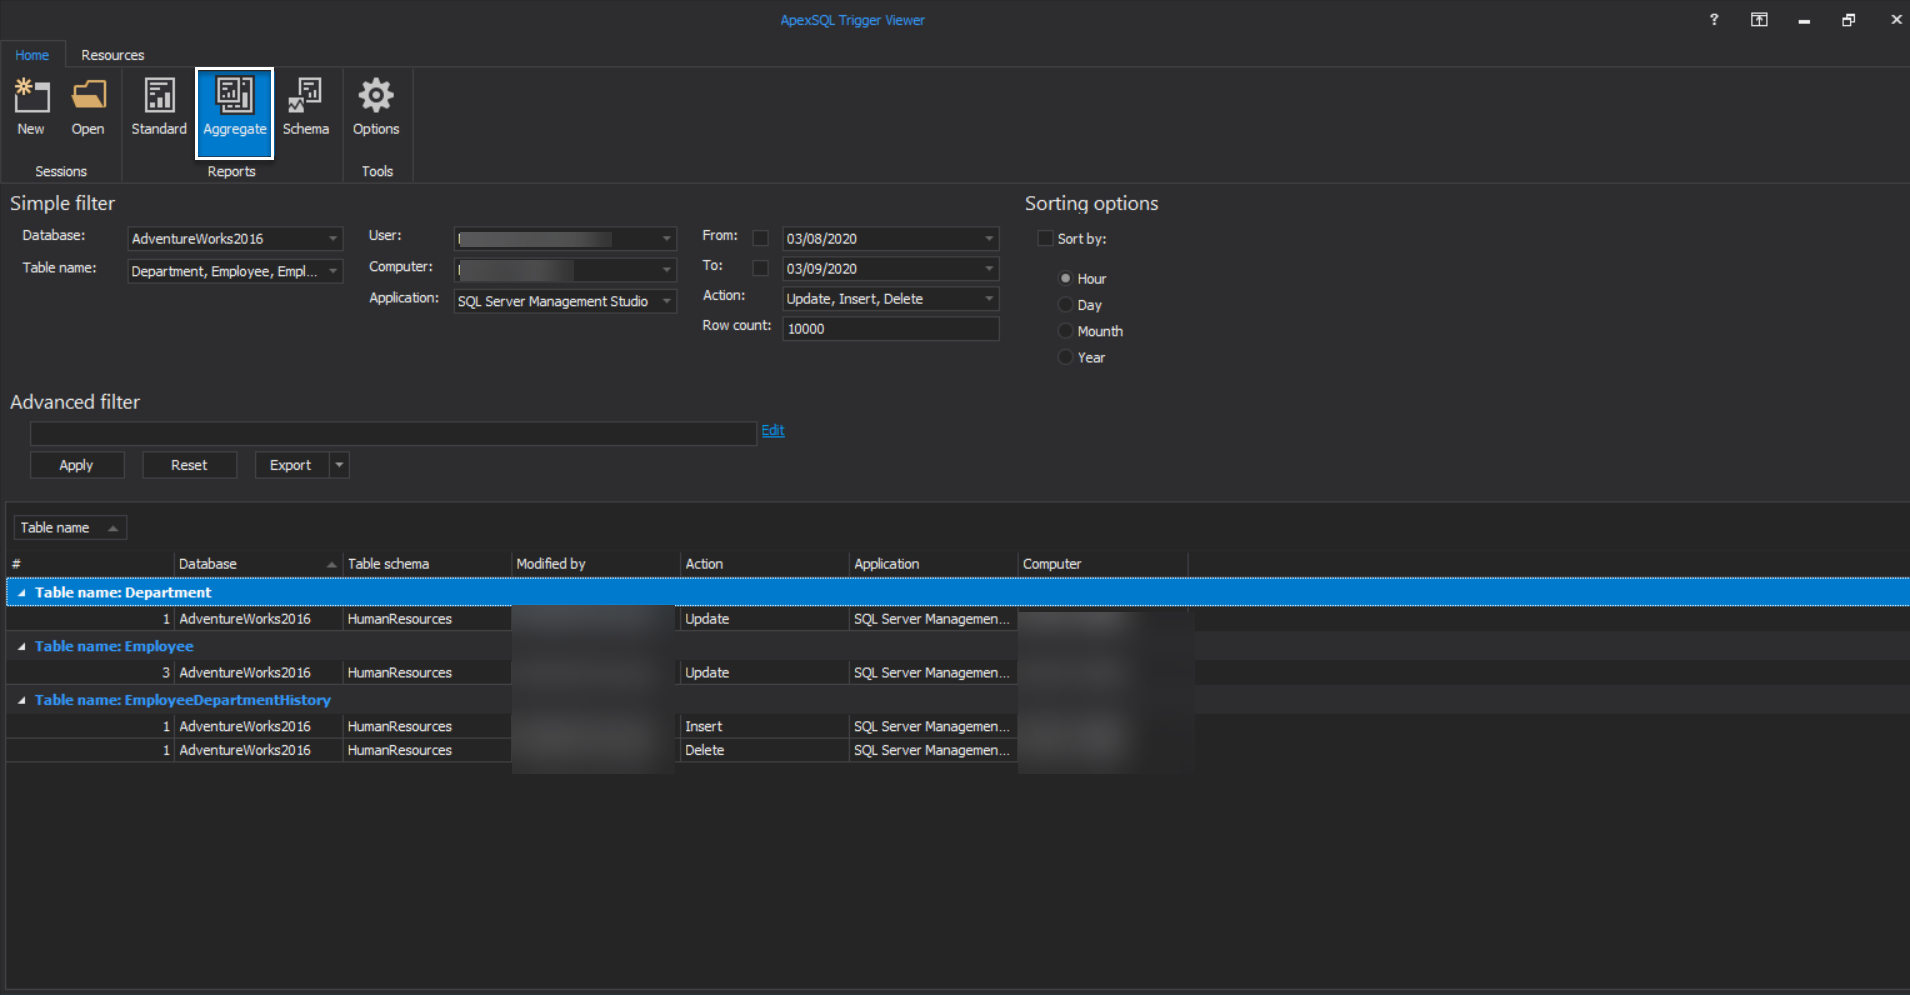 ApexSQL Trigger Viewer -Aggregate